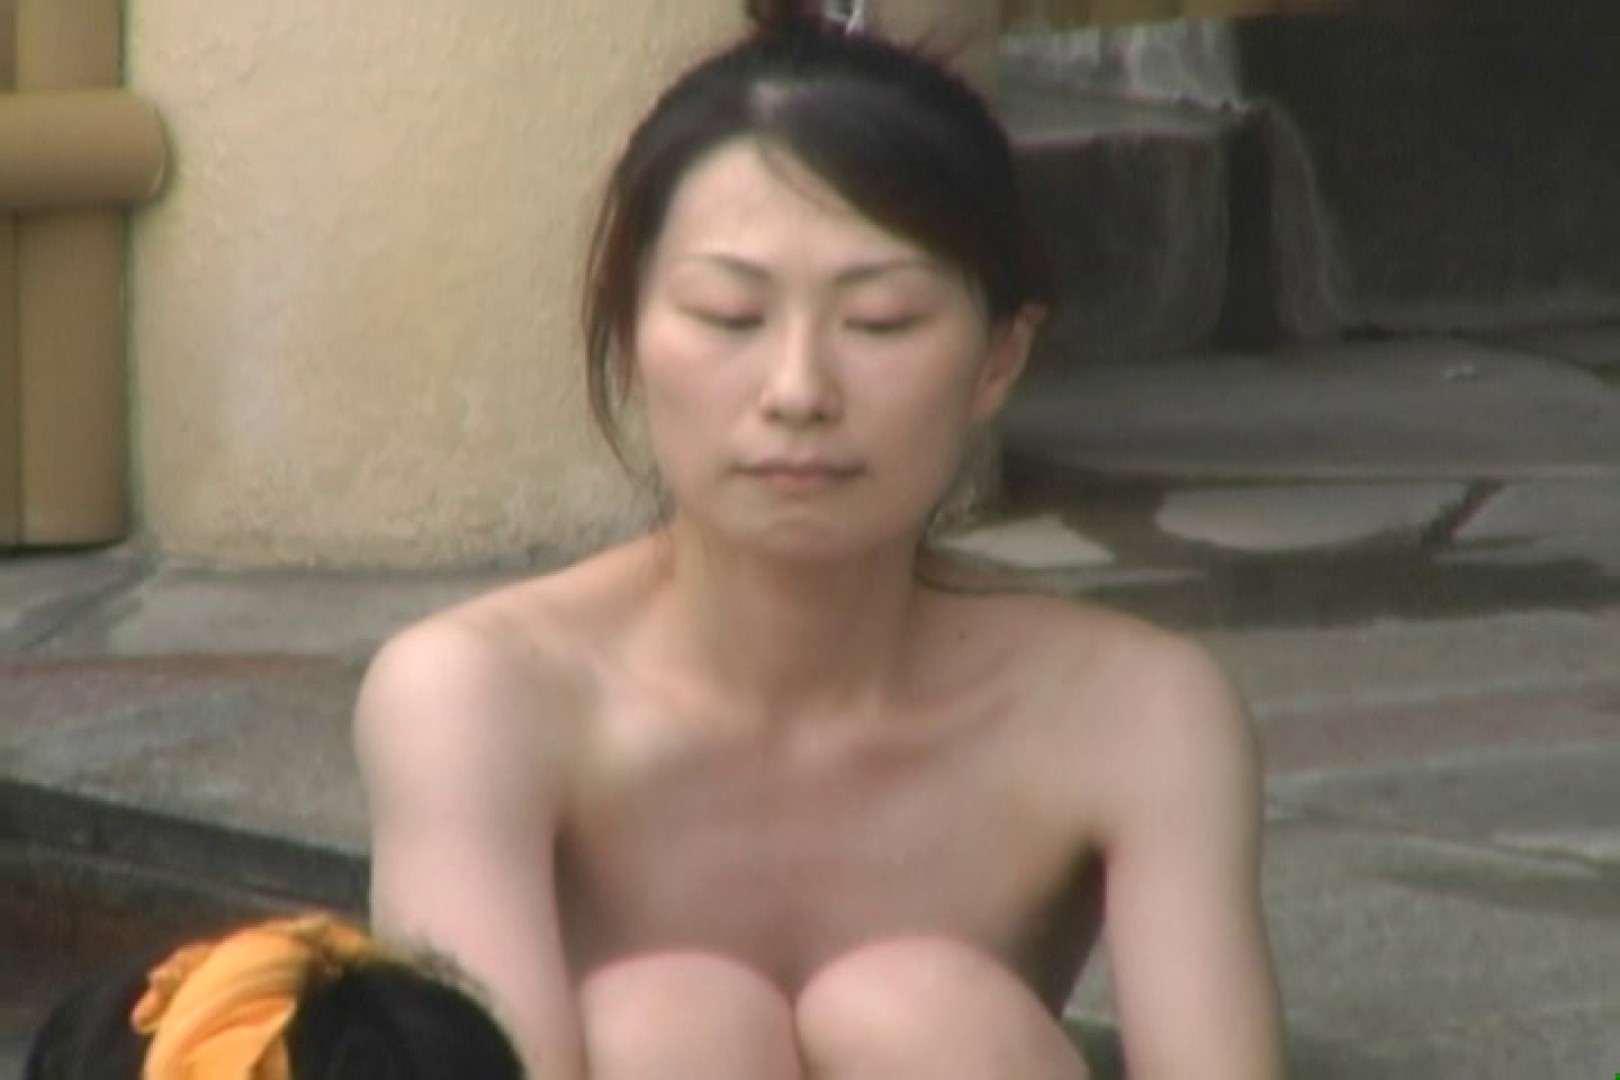 Aquaな露天風呂Vol.615 0  36連発 8